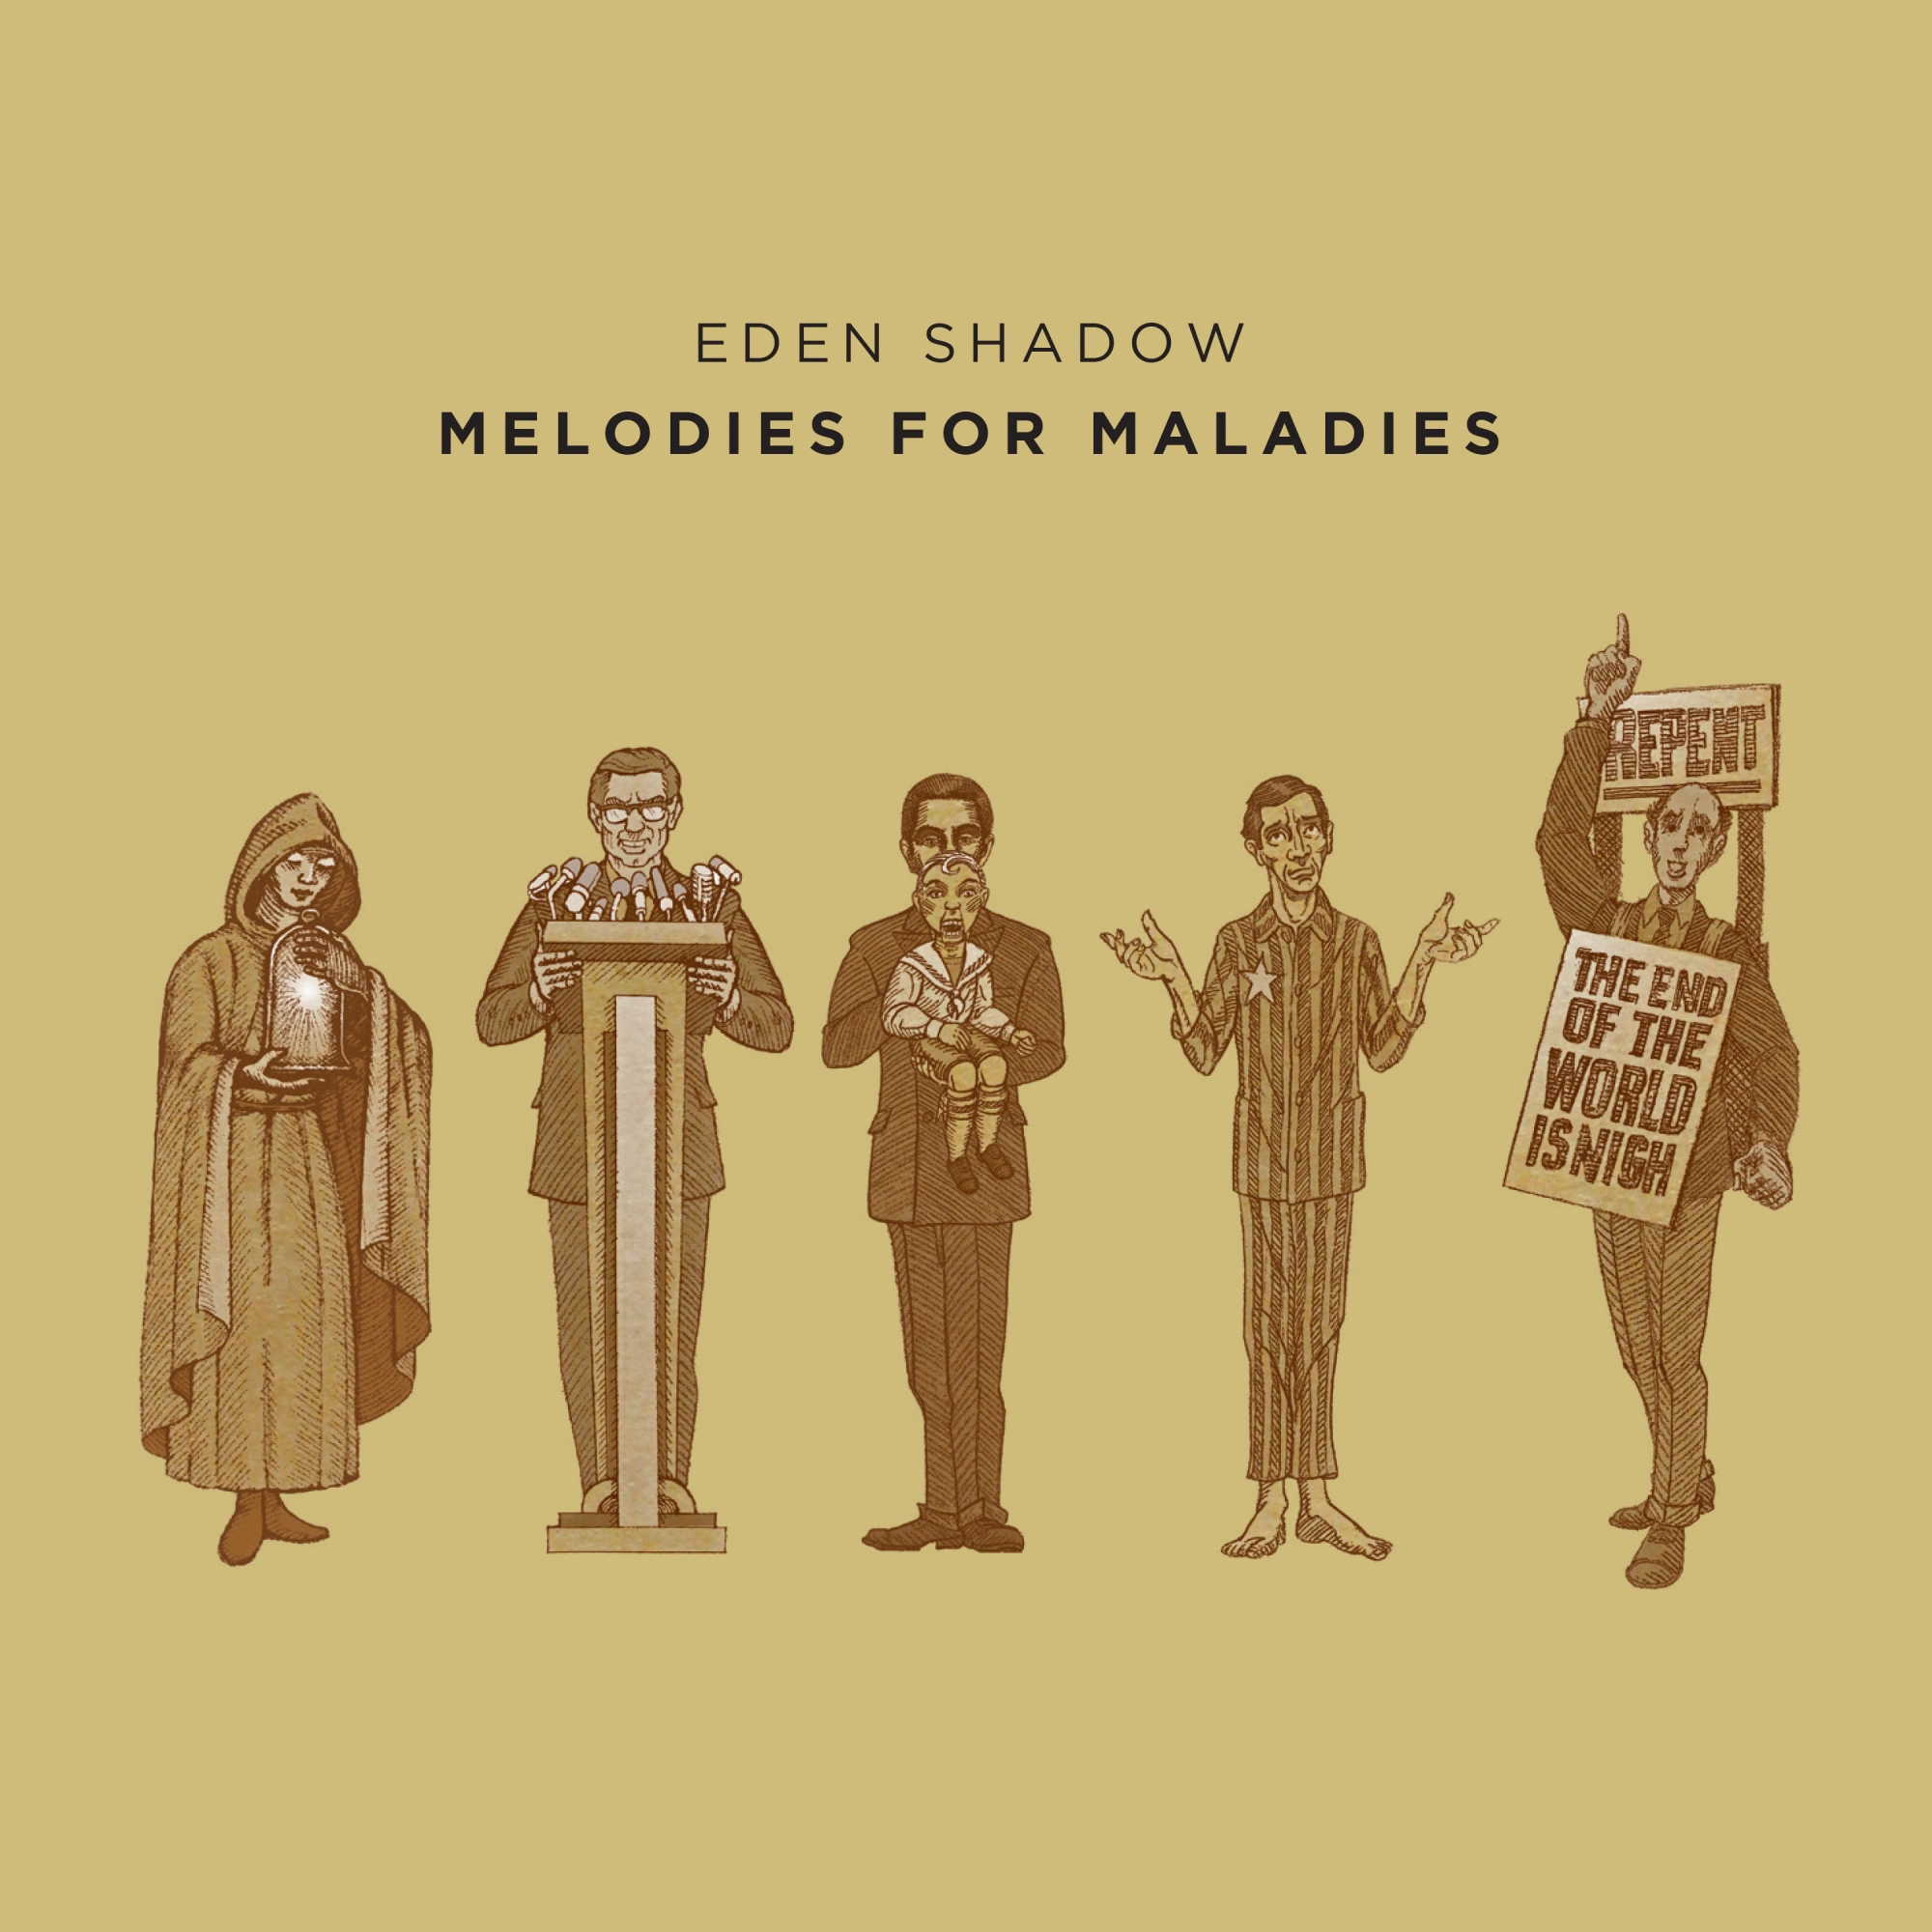 Eden Shadow Melodies for Maladies